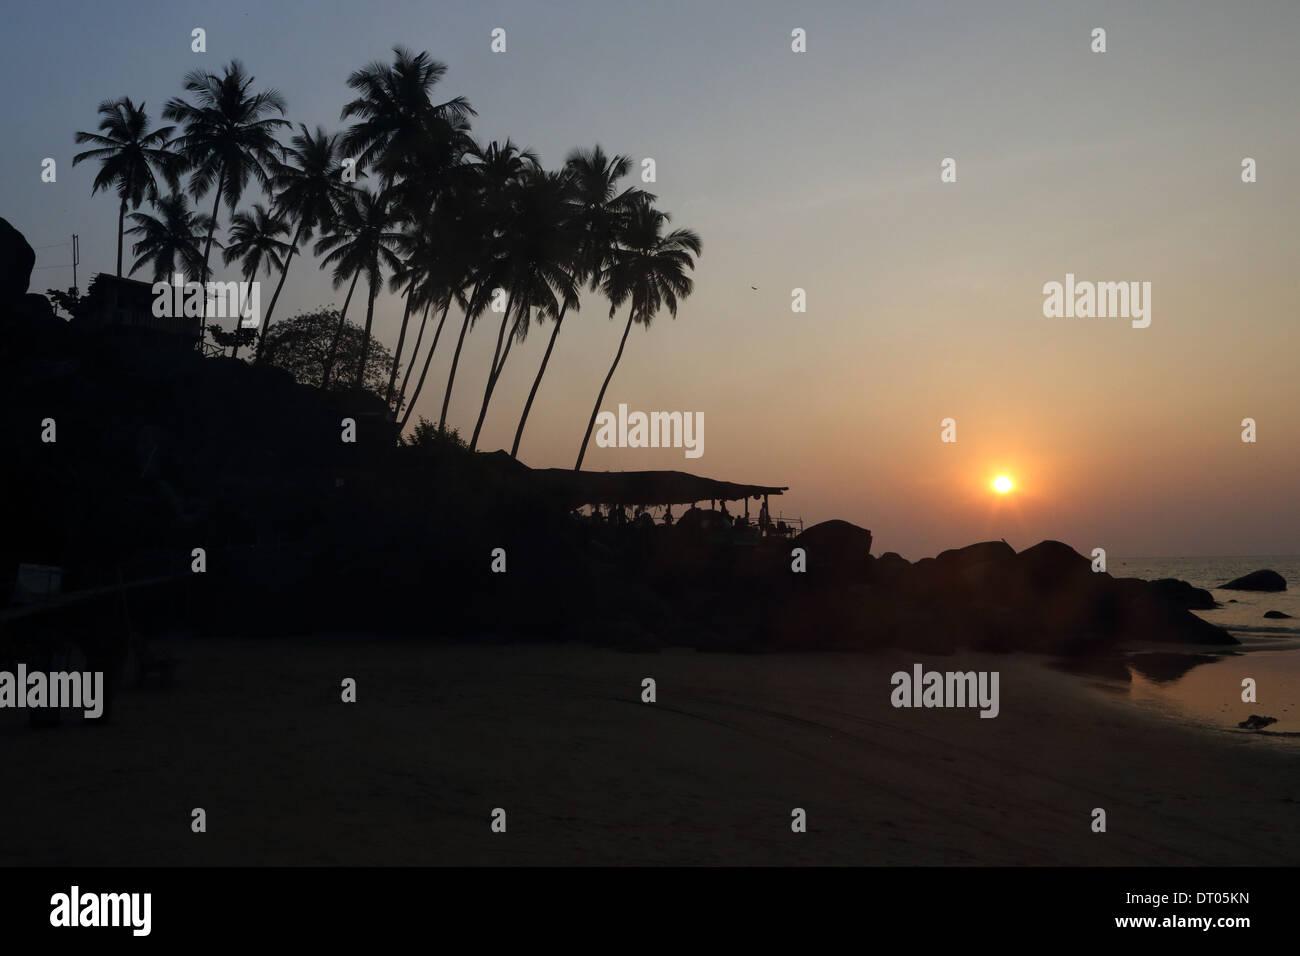 Palolem beach in Goa, India India del Sud foto: pixstory / Alamy Immagini Stock